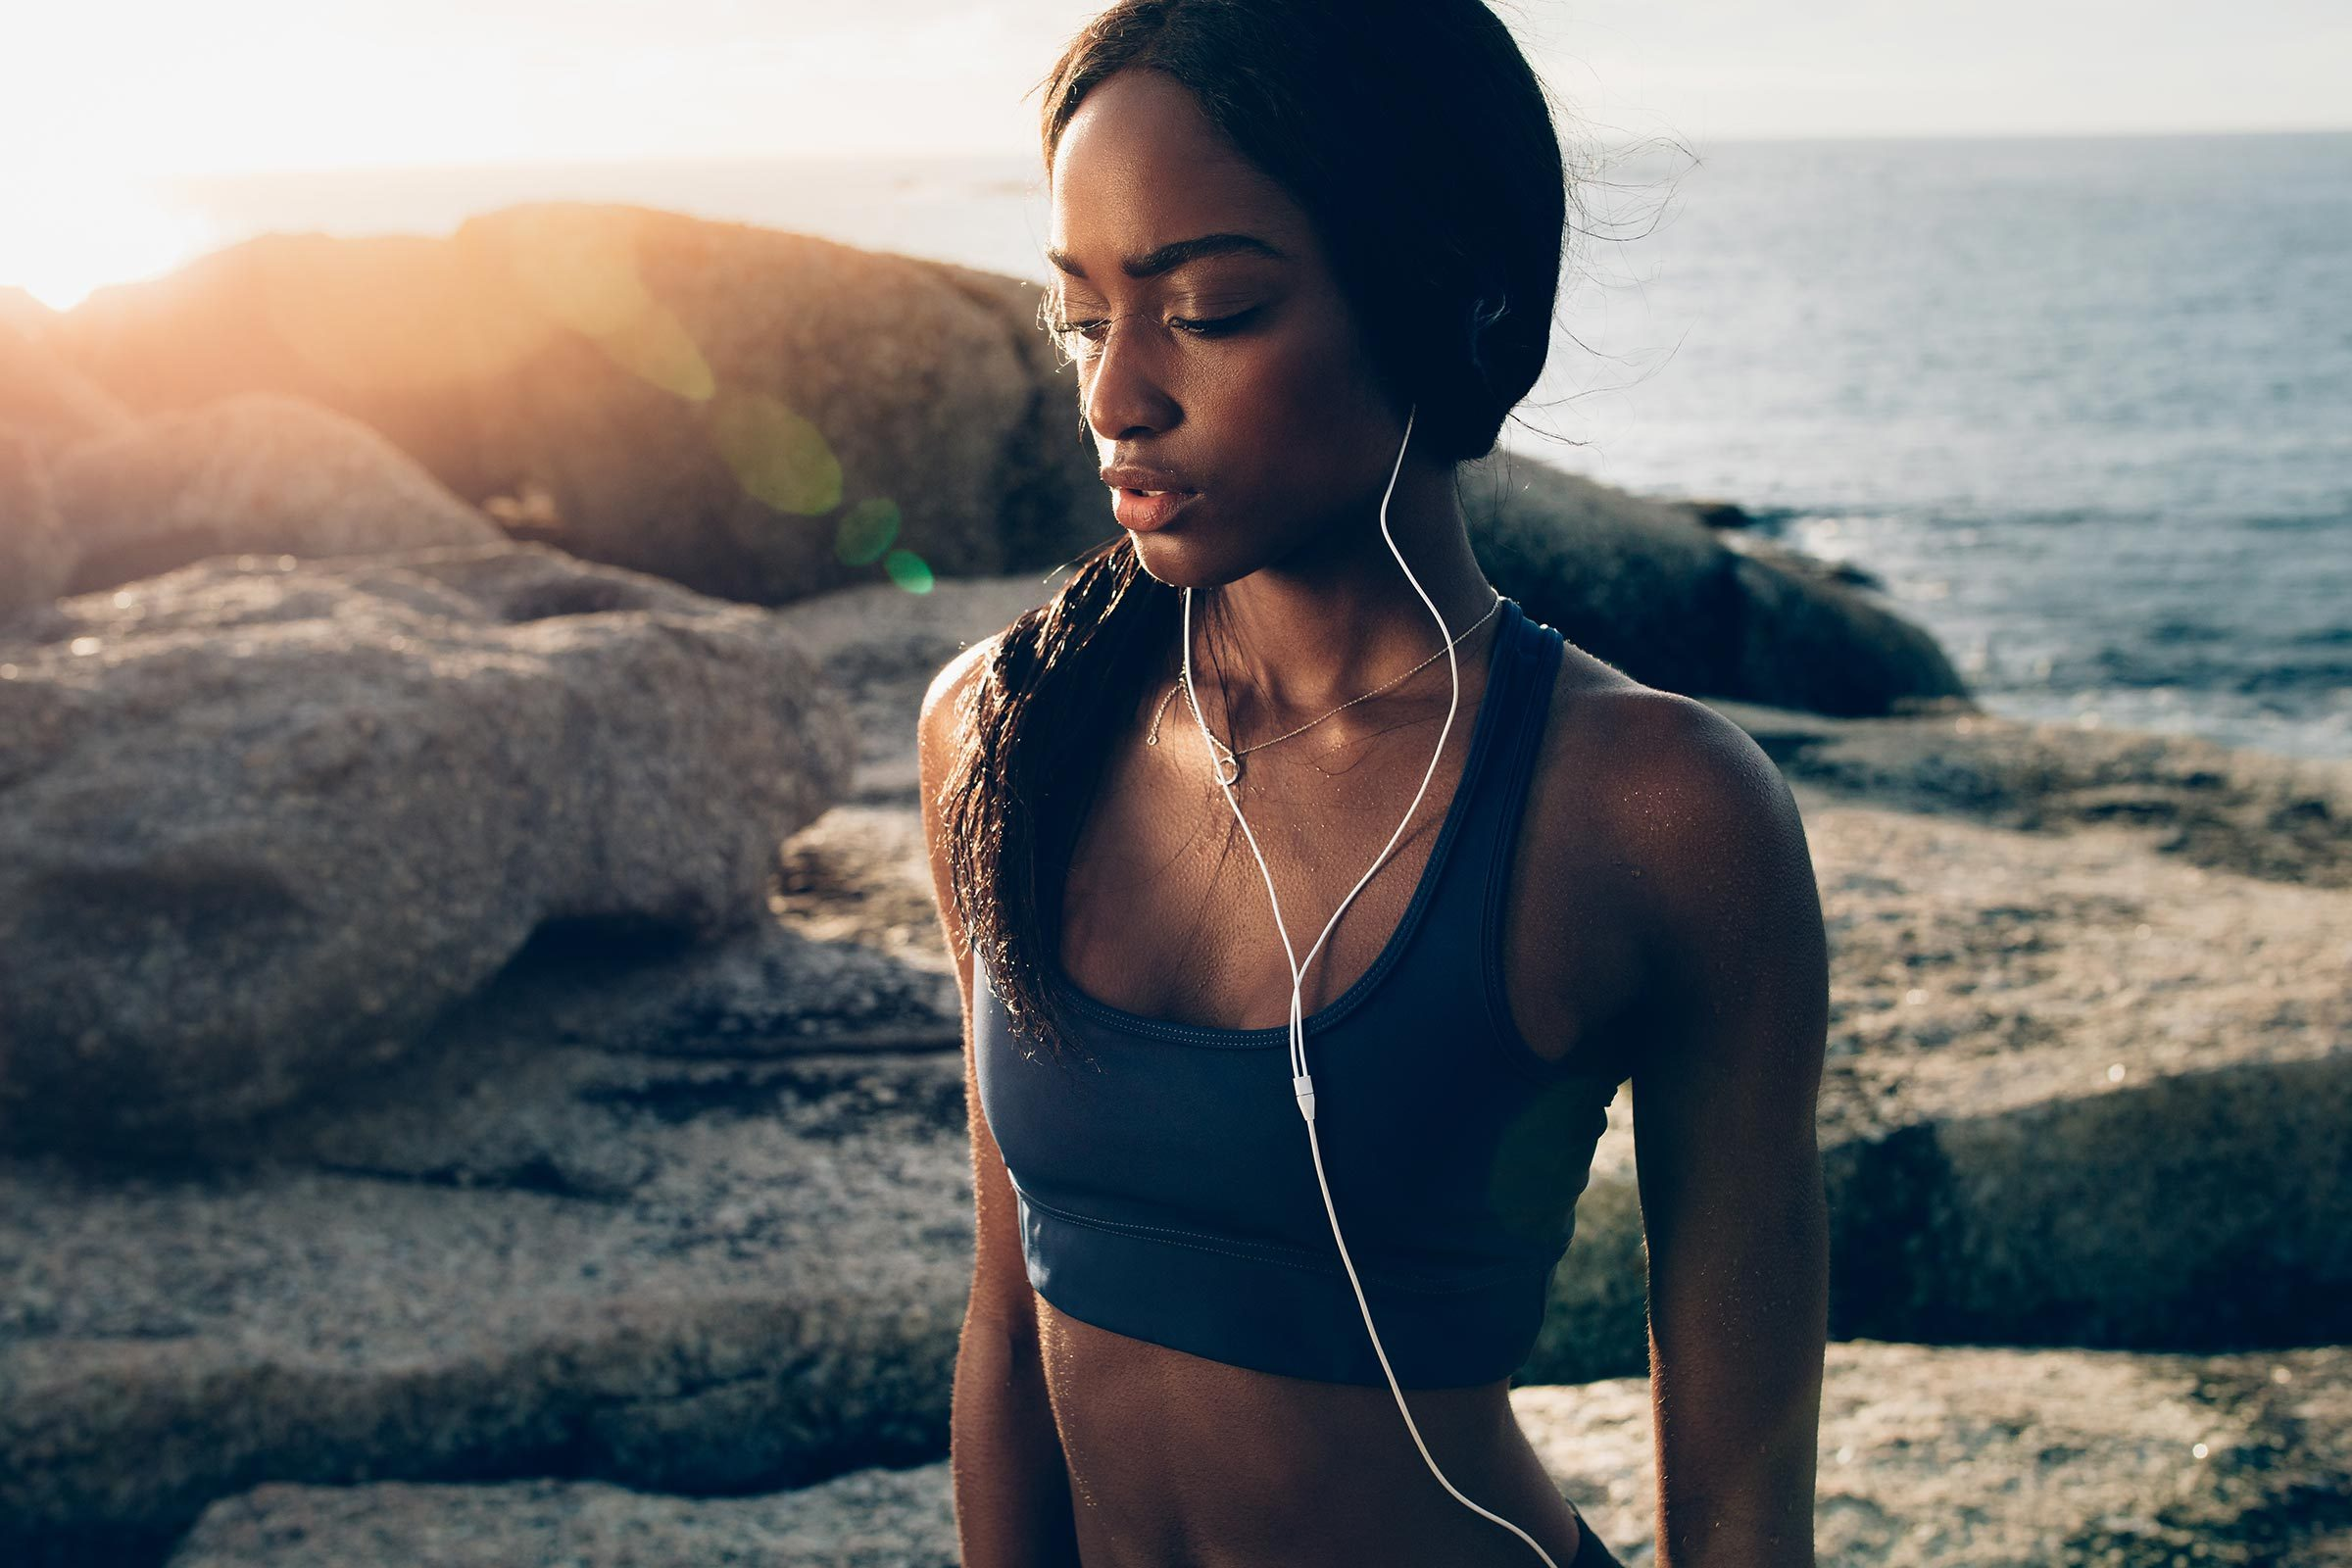 woman fitness sun flare ocean